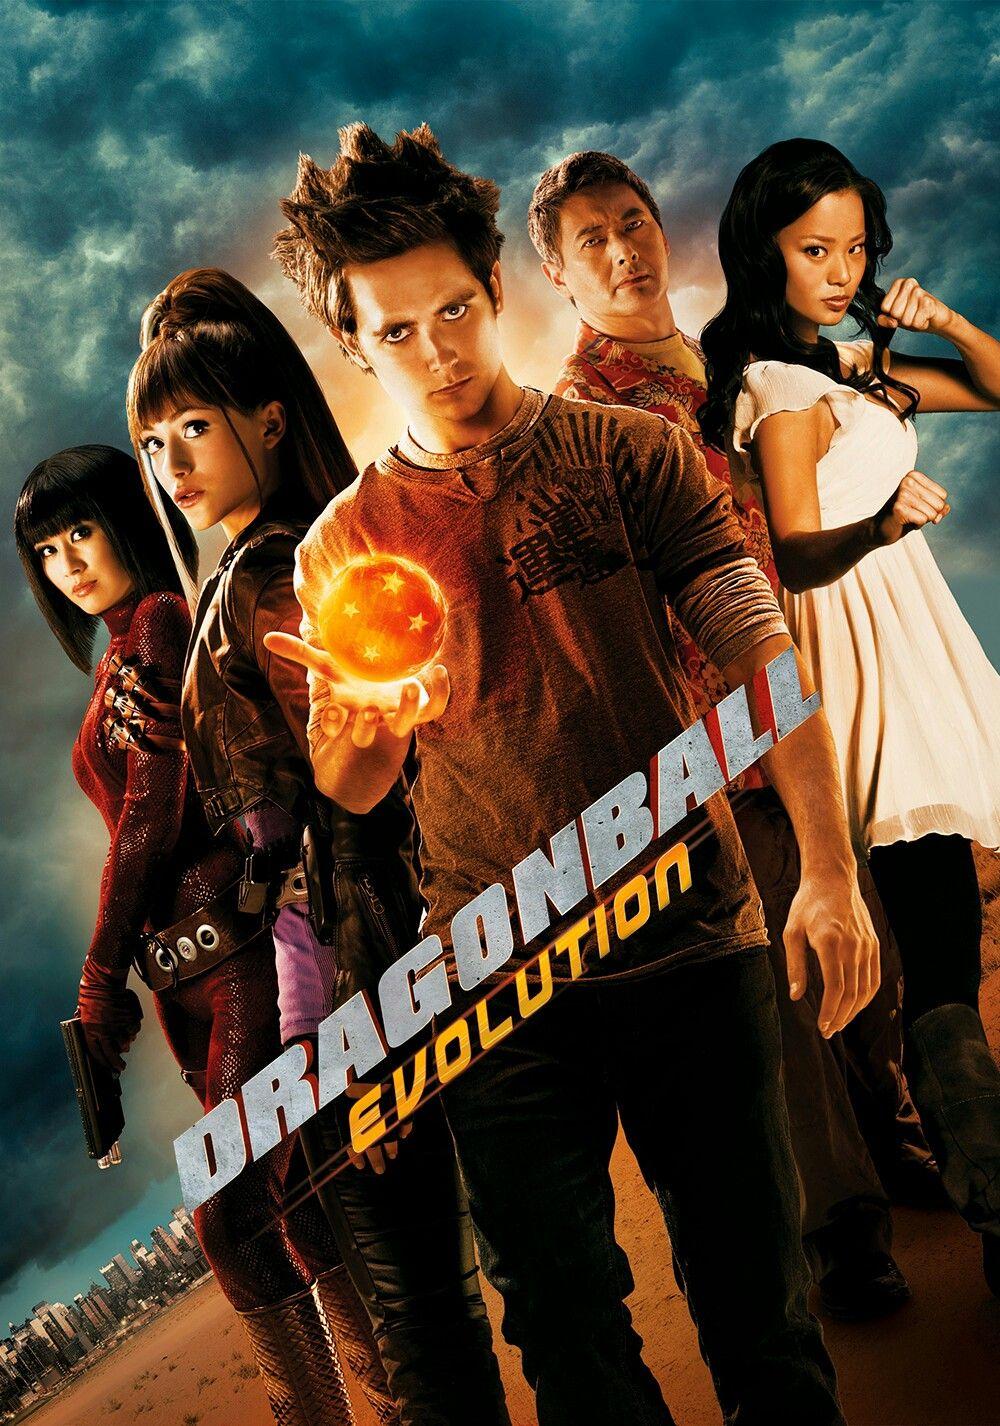 Dragonball Evolution Dragonball Evolution Dragonball Evolution Full Movie Full Movies